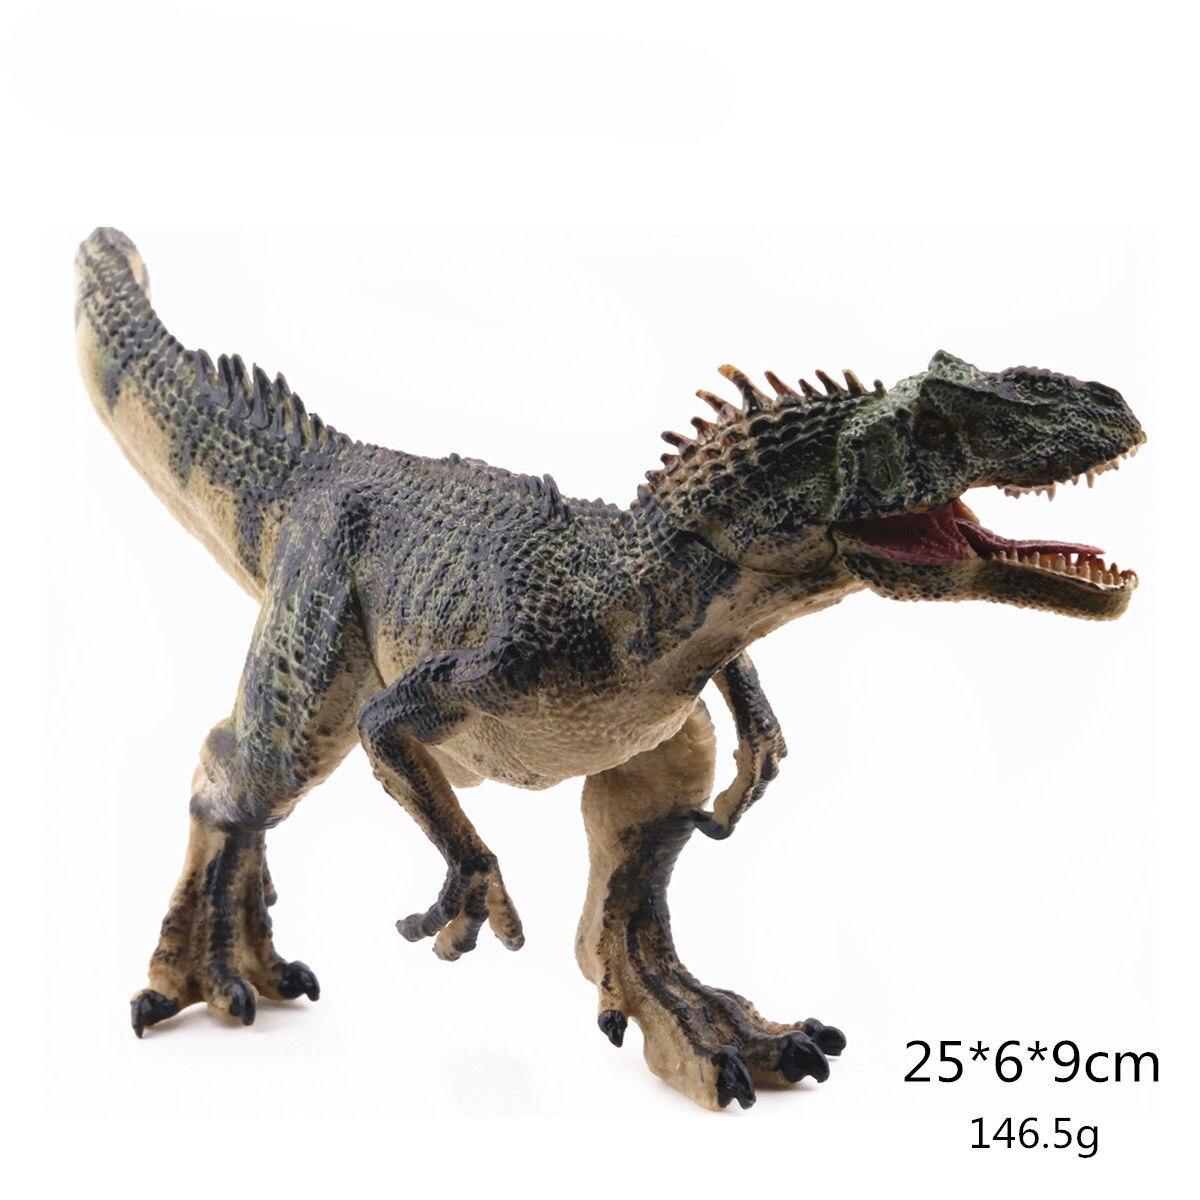 Indoraptor Blue Velociraptor Figure Jurassic Dinosaur Animal Model Ancient Biological Adult Kids Collection Toys Gift Home Decor